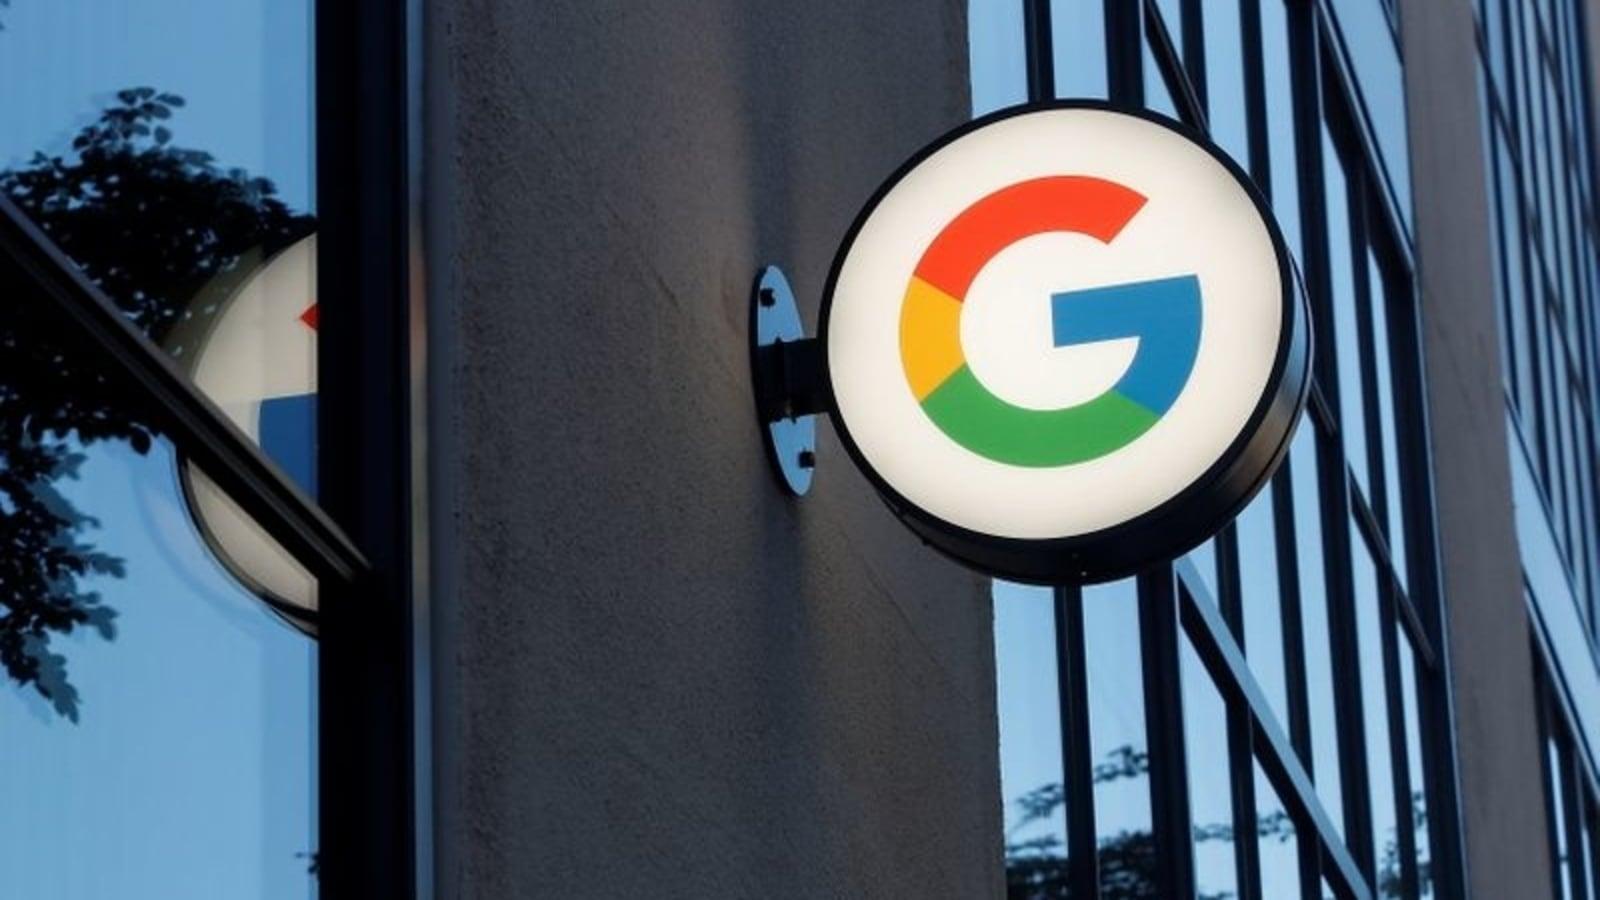 Delhi HC asks Centre, Google, YouTube to remove offensive